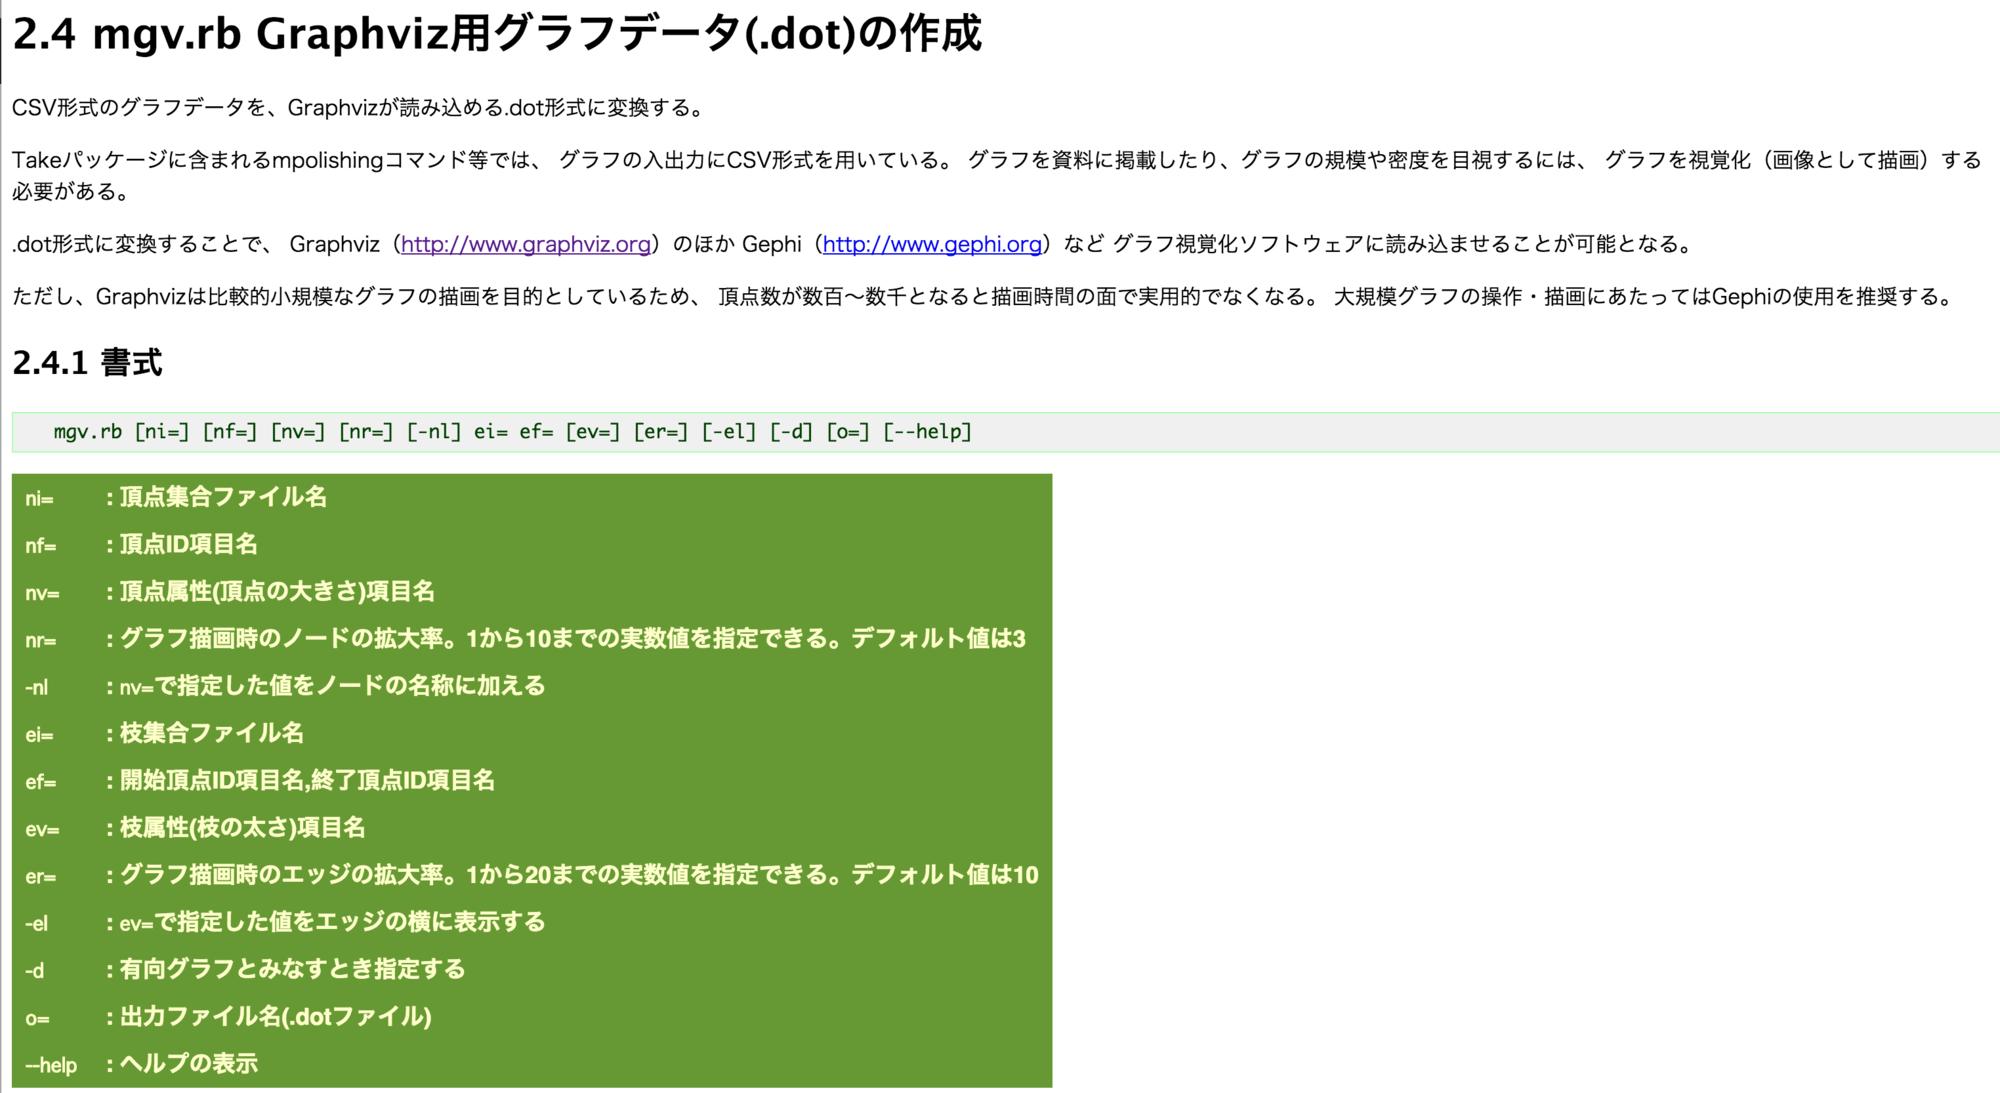 f:id:doryokujin:20160616151525p:plain